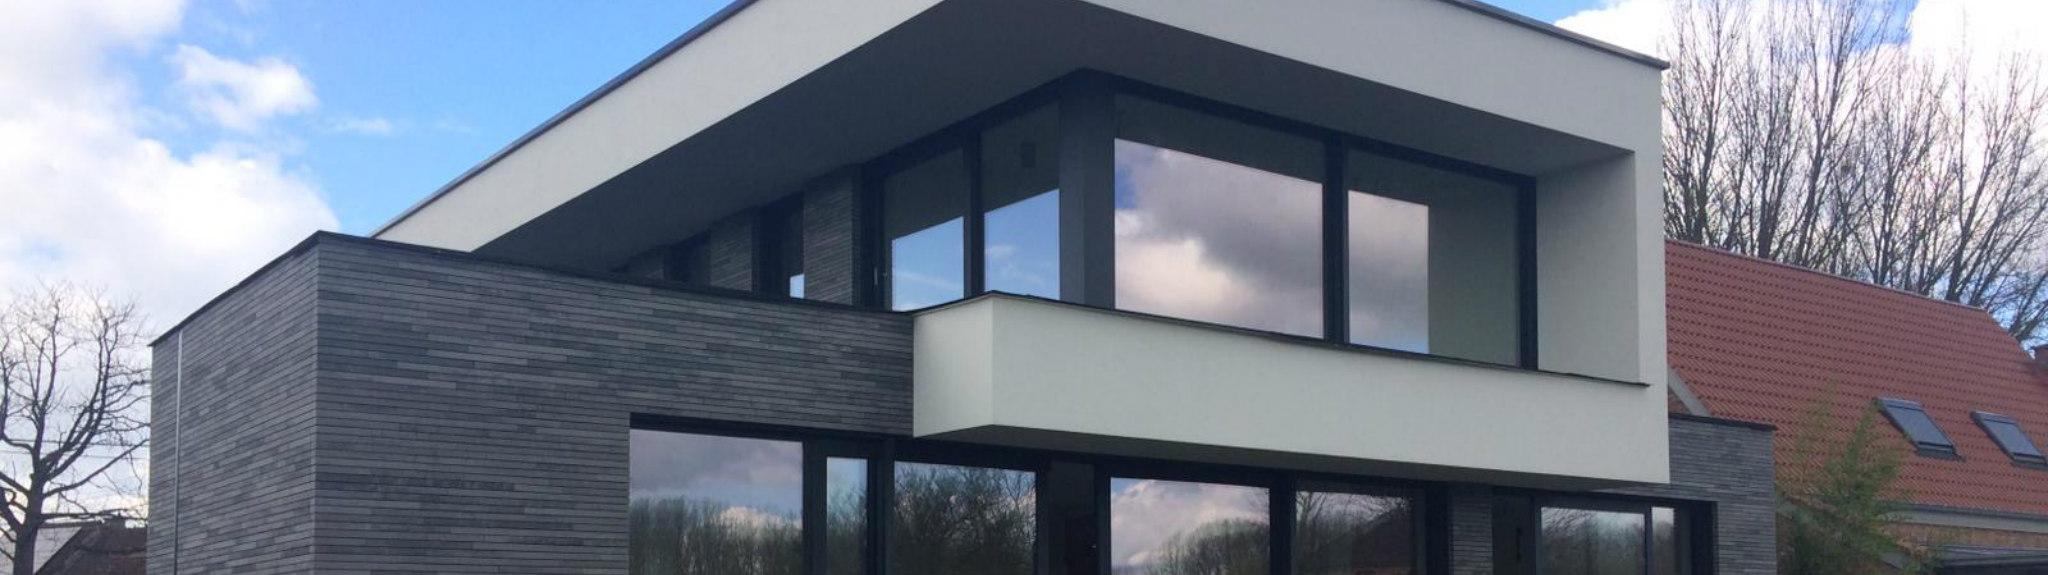 Ninove ramen en deuren